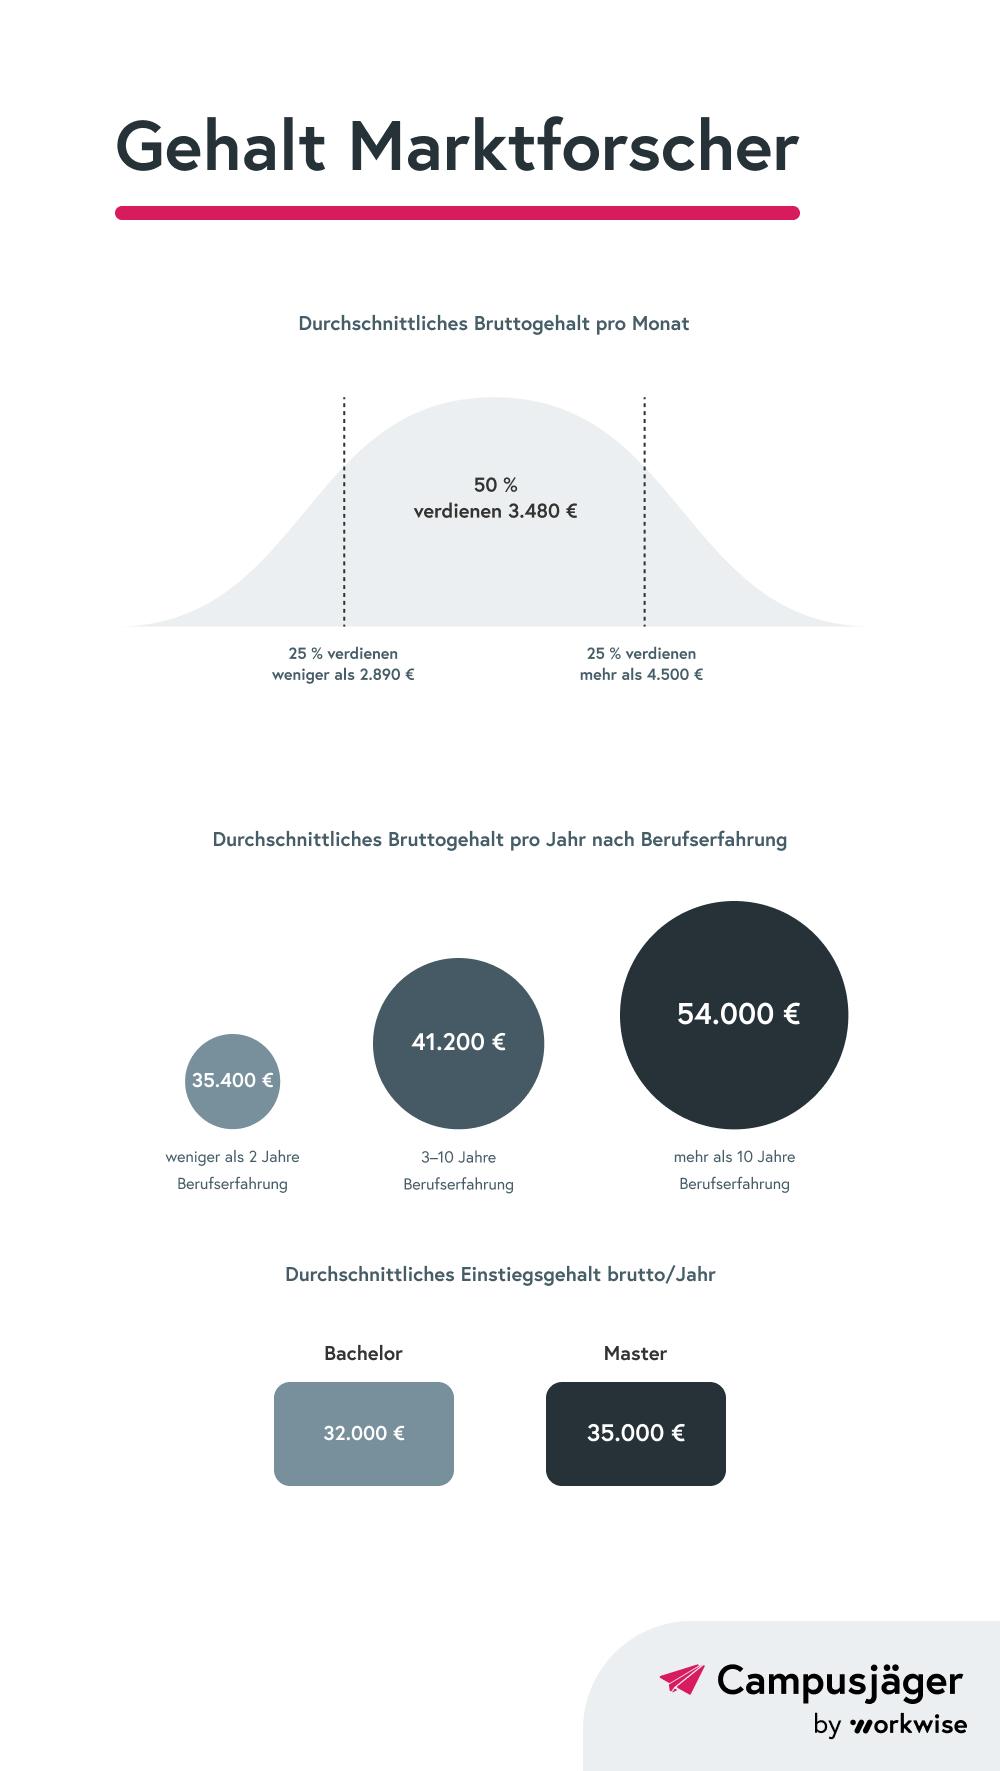 Marktforscher-Gehalt-Infografik